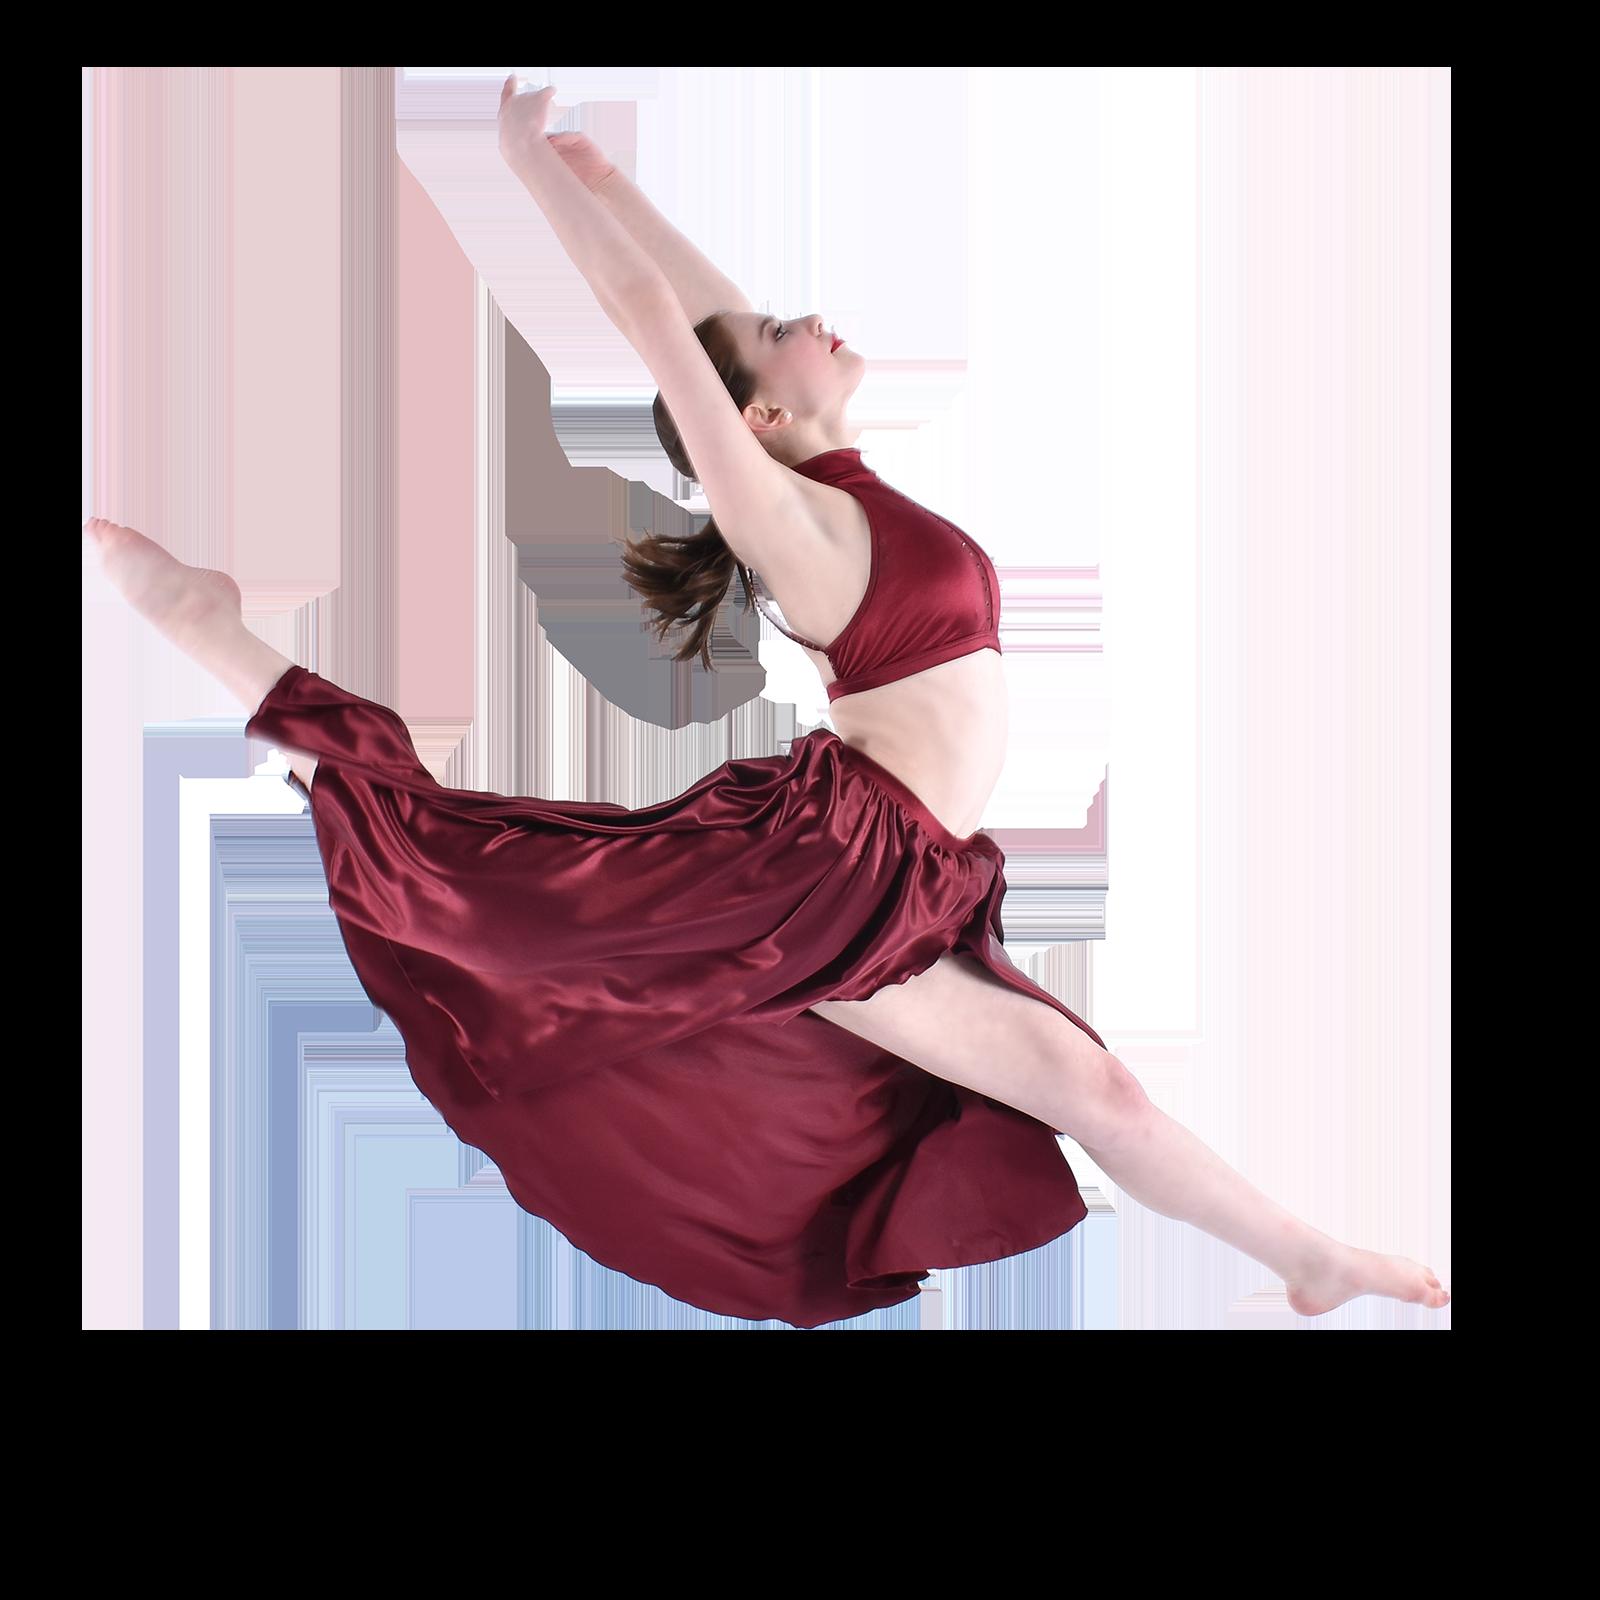 teenage lyrical contemporary dancer jumping